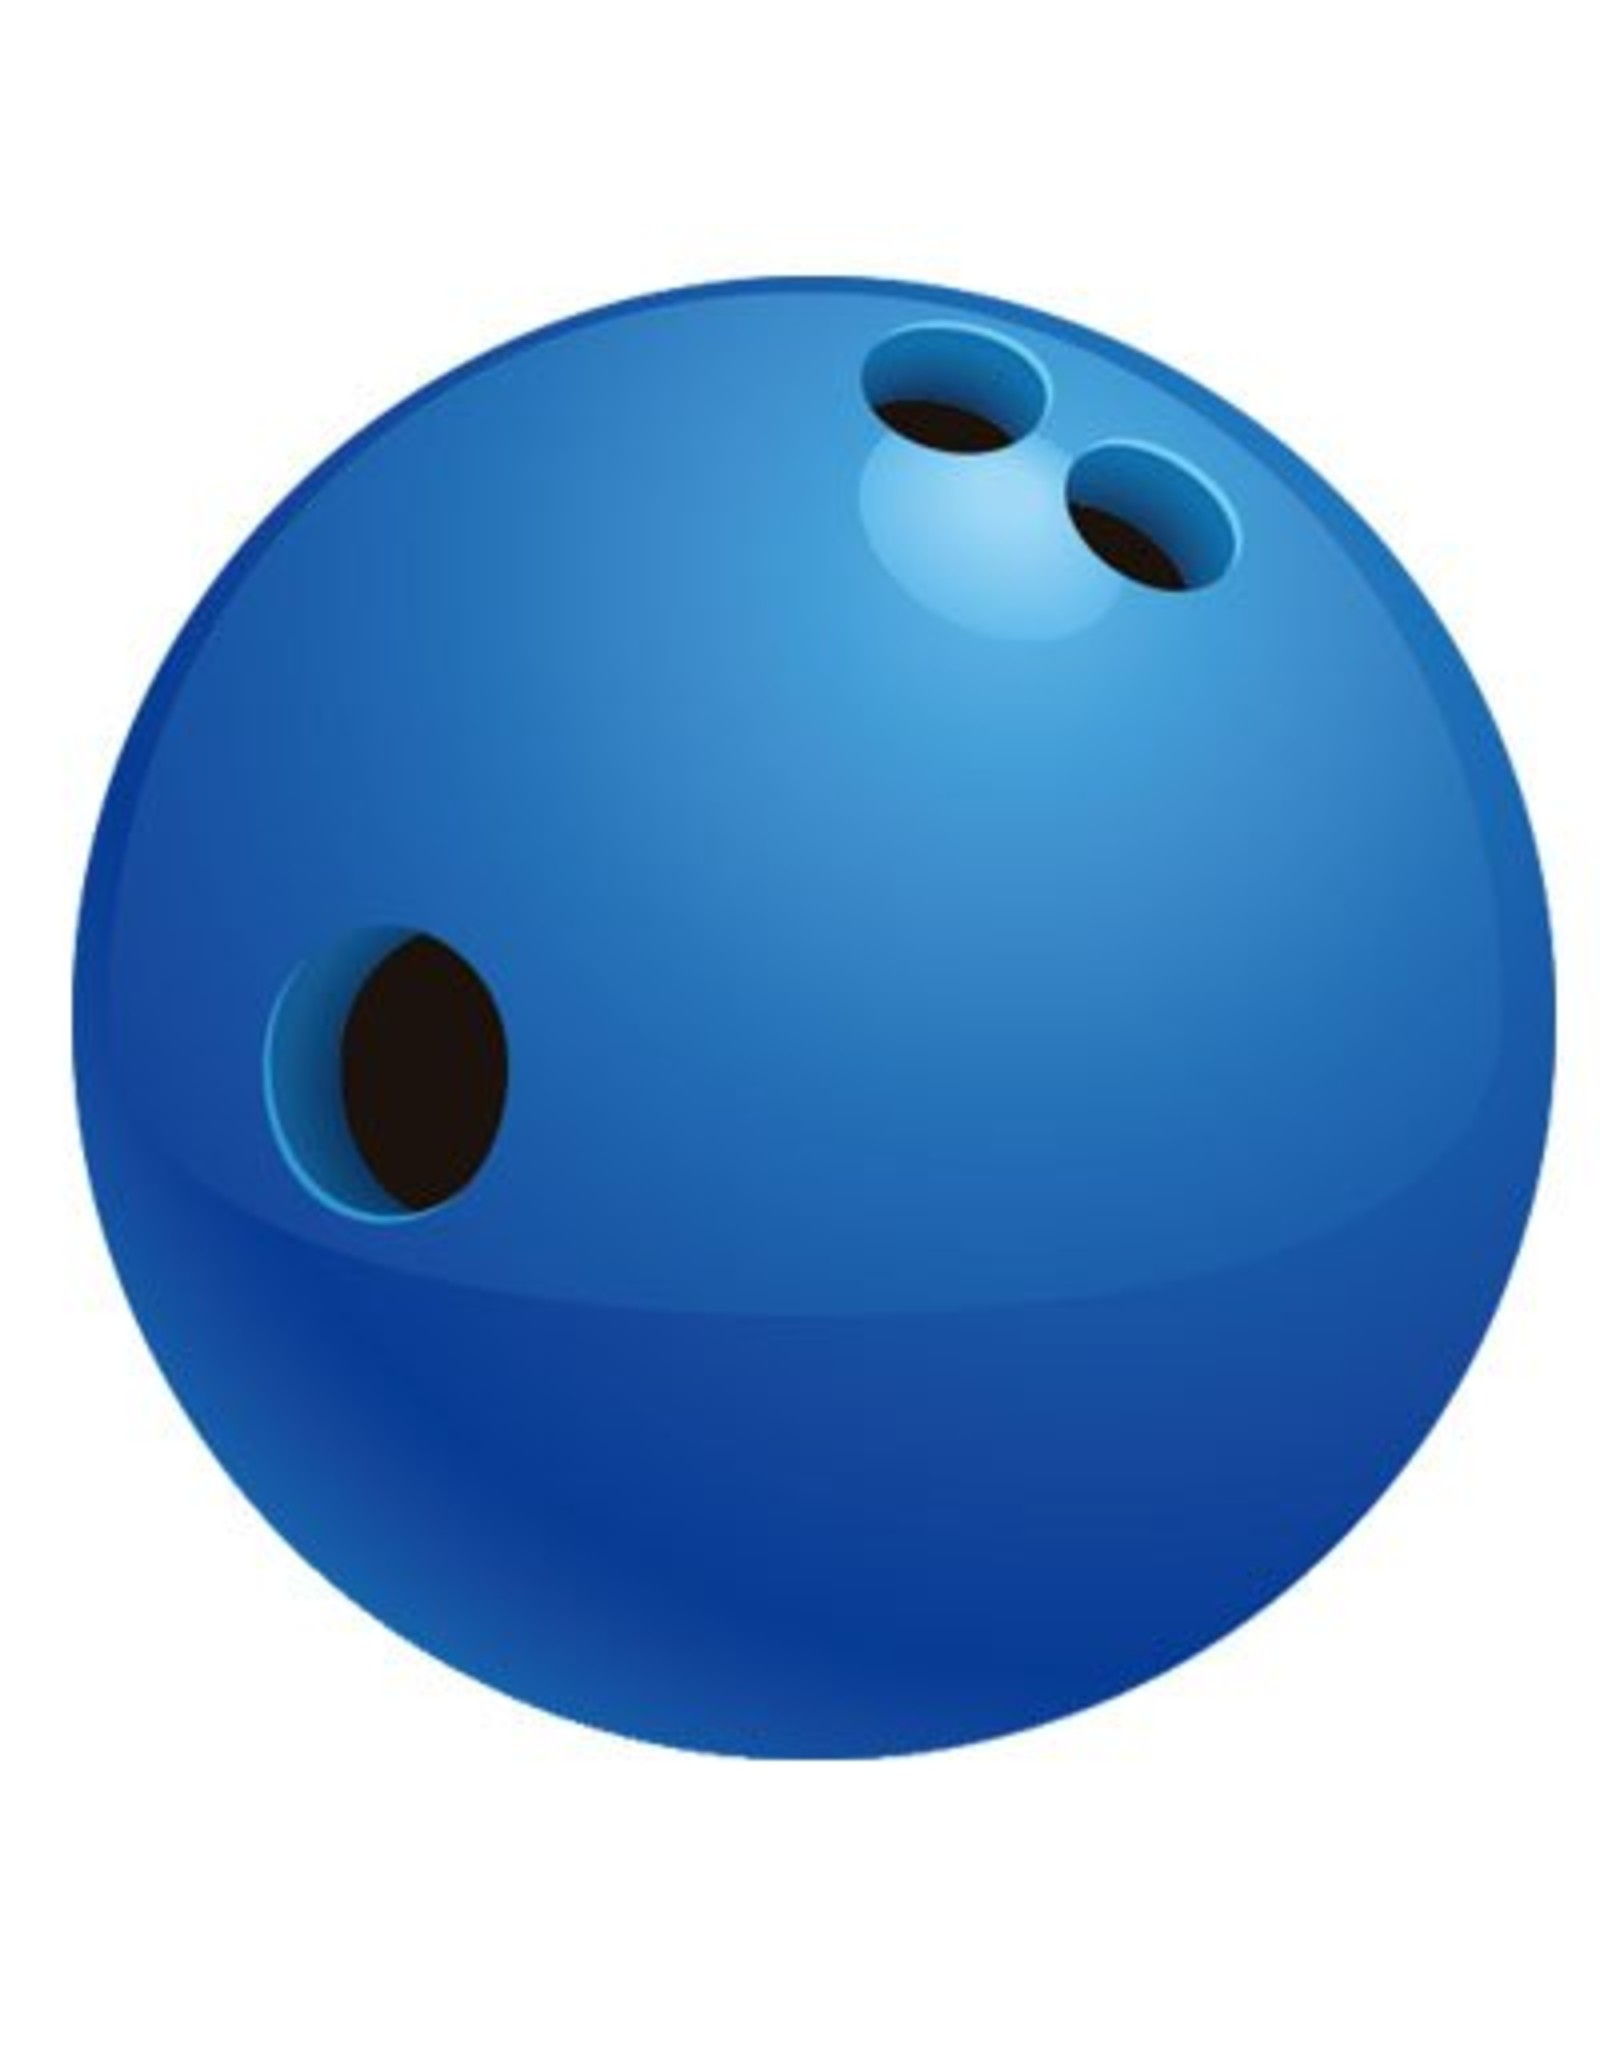 Telefoonbutton 'Bowlingbal' - Body & Soap